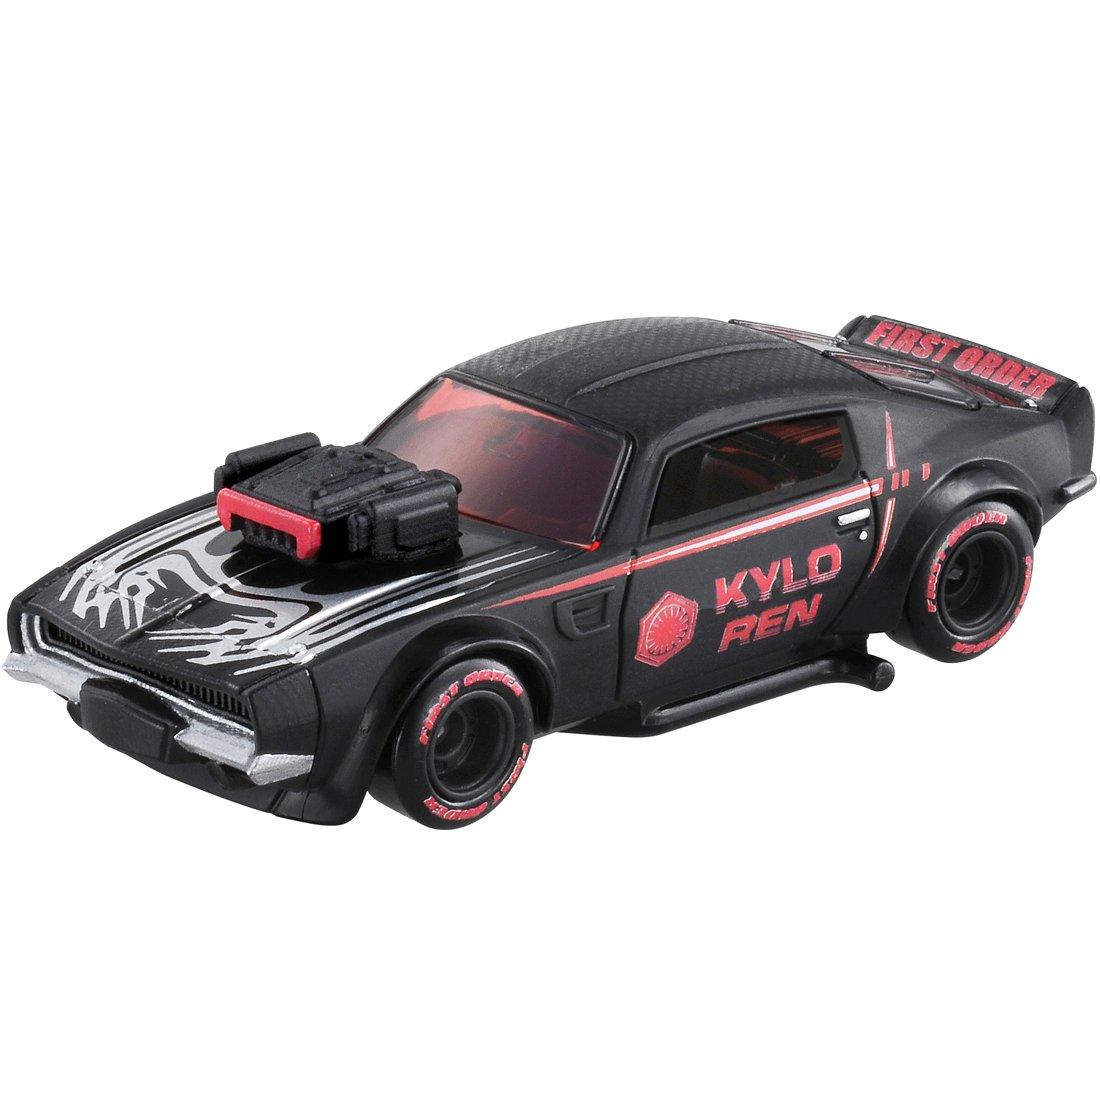 Tomica Star Wars SC-04 Star Cars Boba Fett TR 5000 B